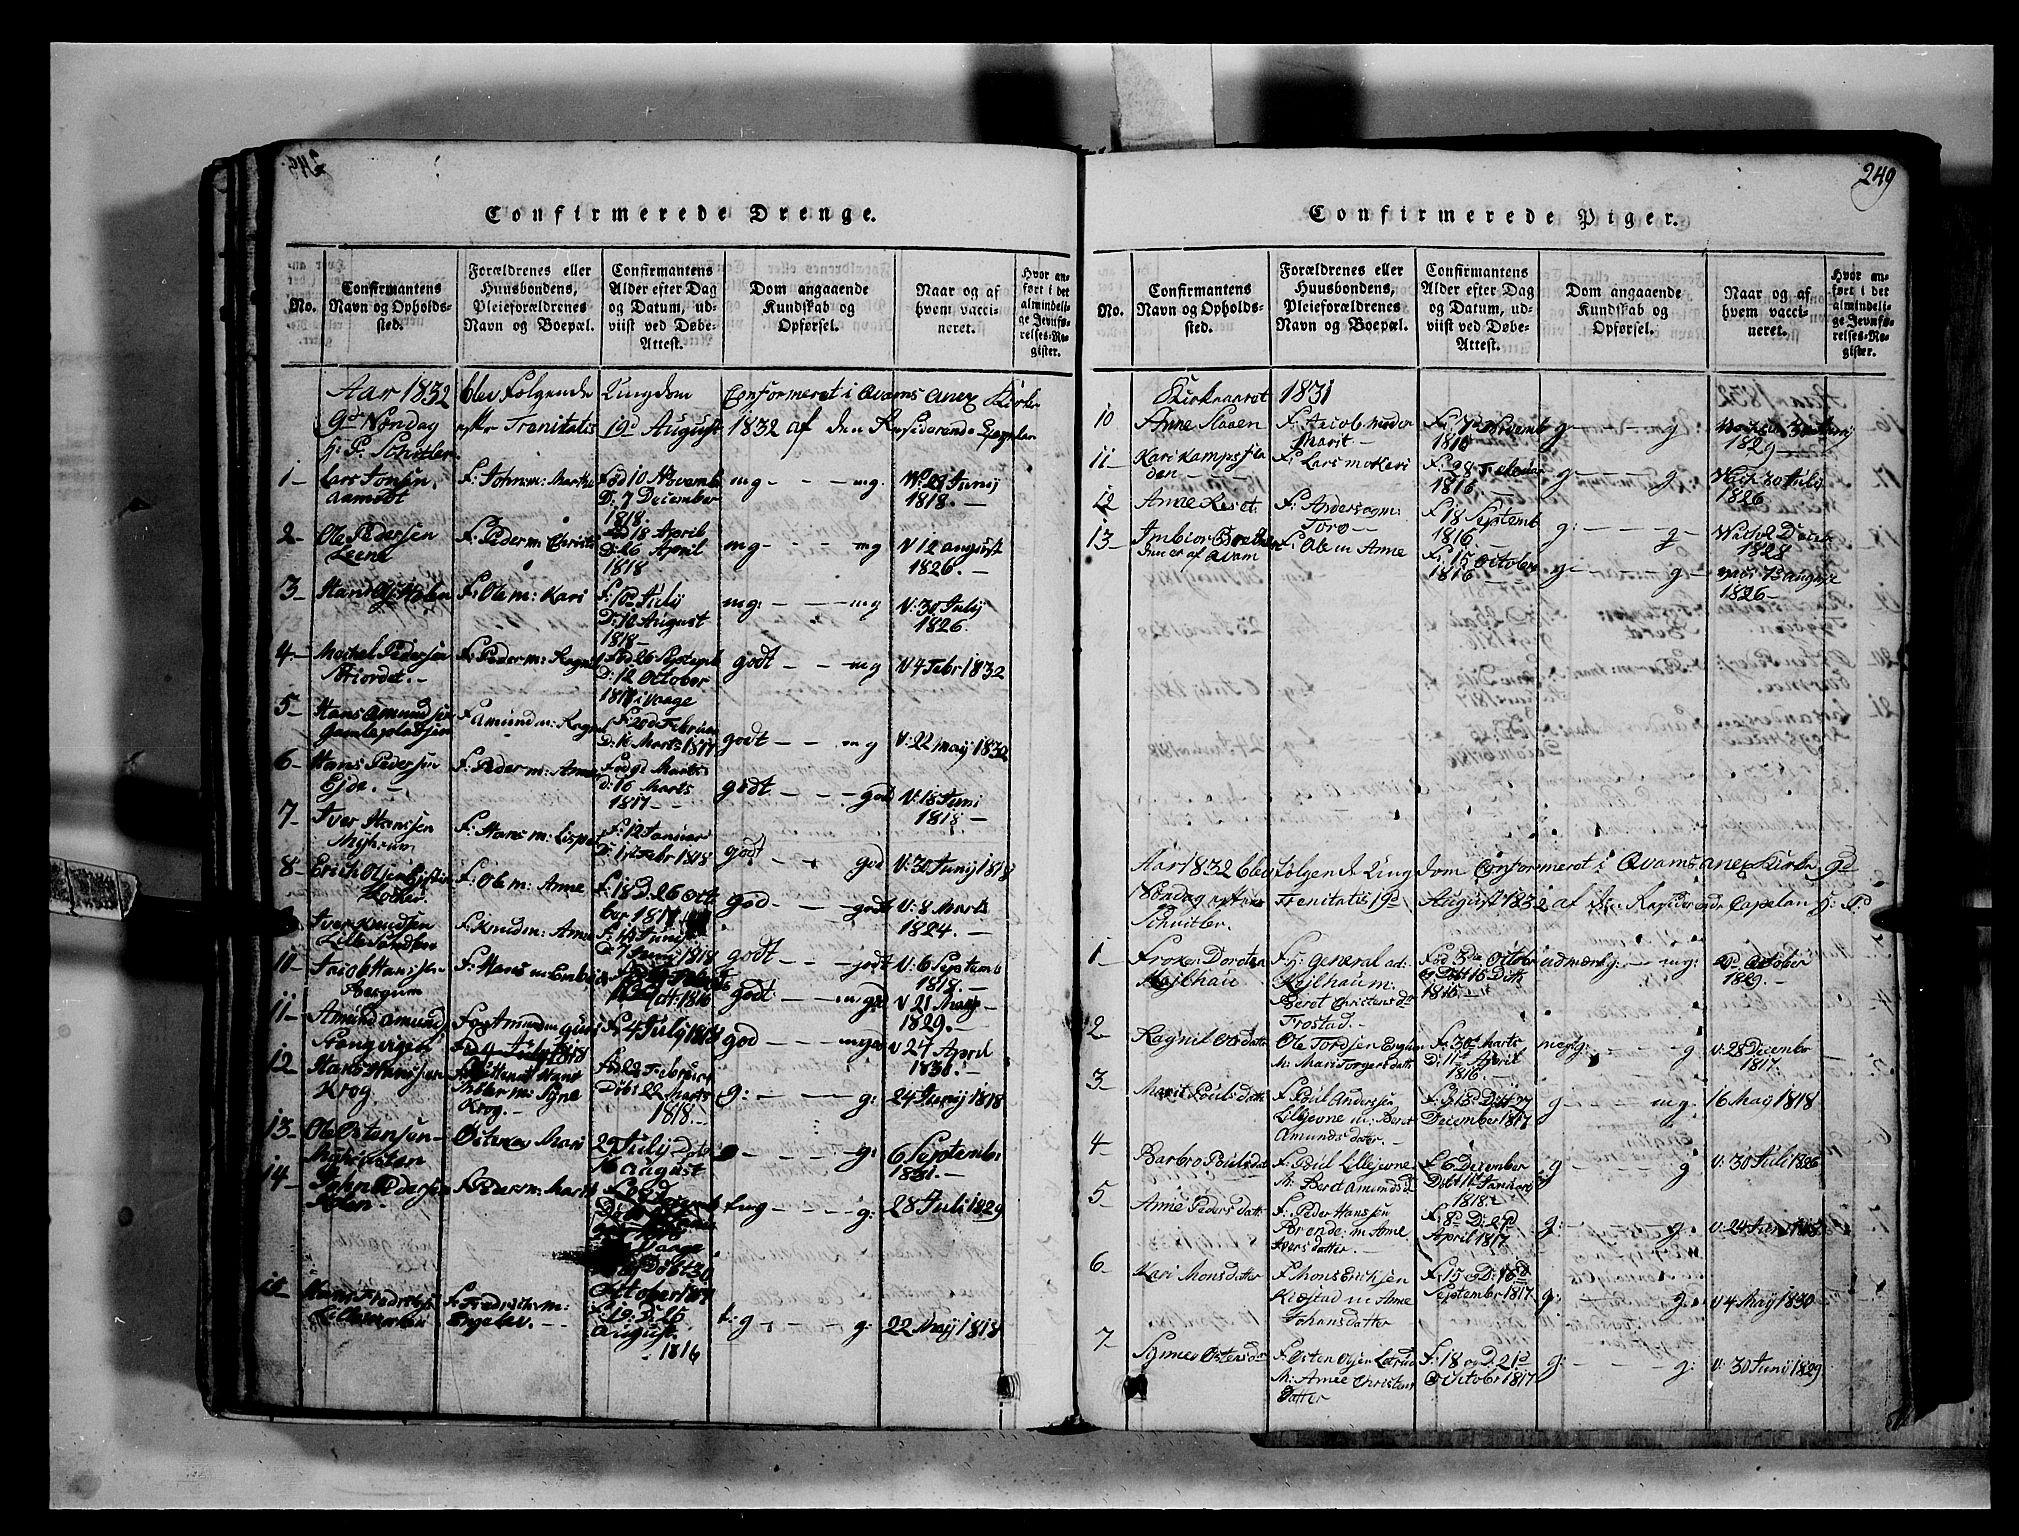 SAH, Fron prestekontor, H/Ha/Hab/L0002: Klokkerbok nr. 2, 1816-1850, s. 249